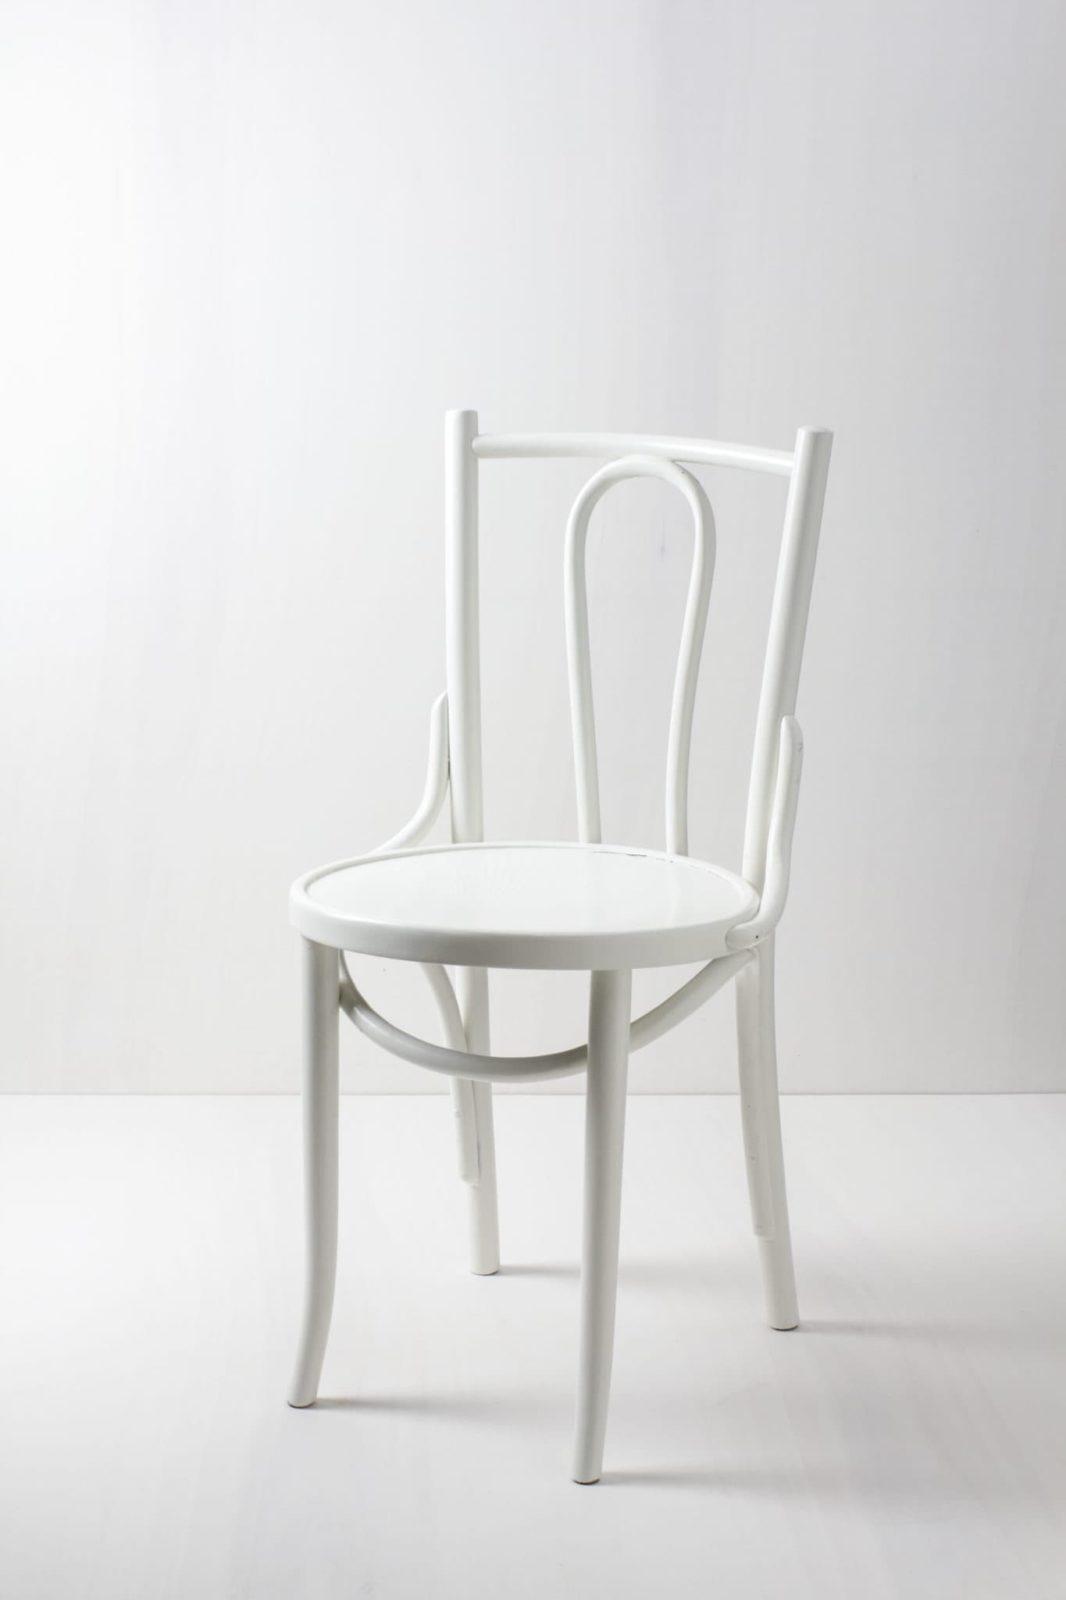 Thonet Stuhl Rosa | Seidenmatt weiss lackierter Thonet Stuhl, ein Klassiker. | gotvintage Rental & Event Design